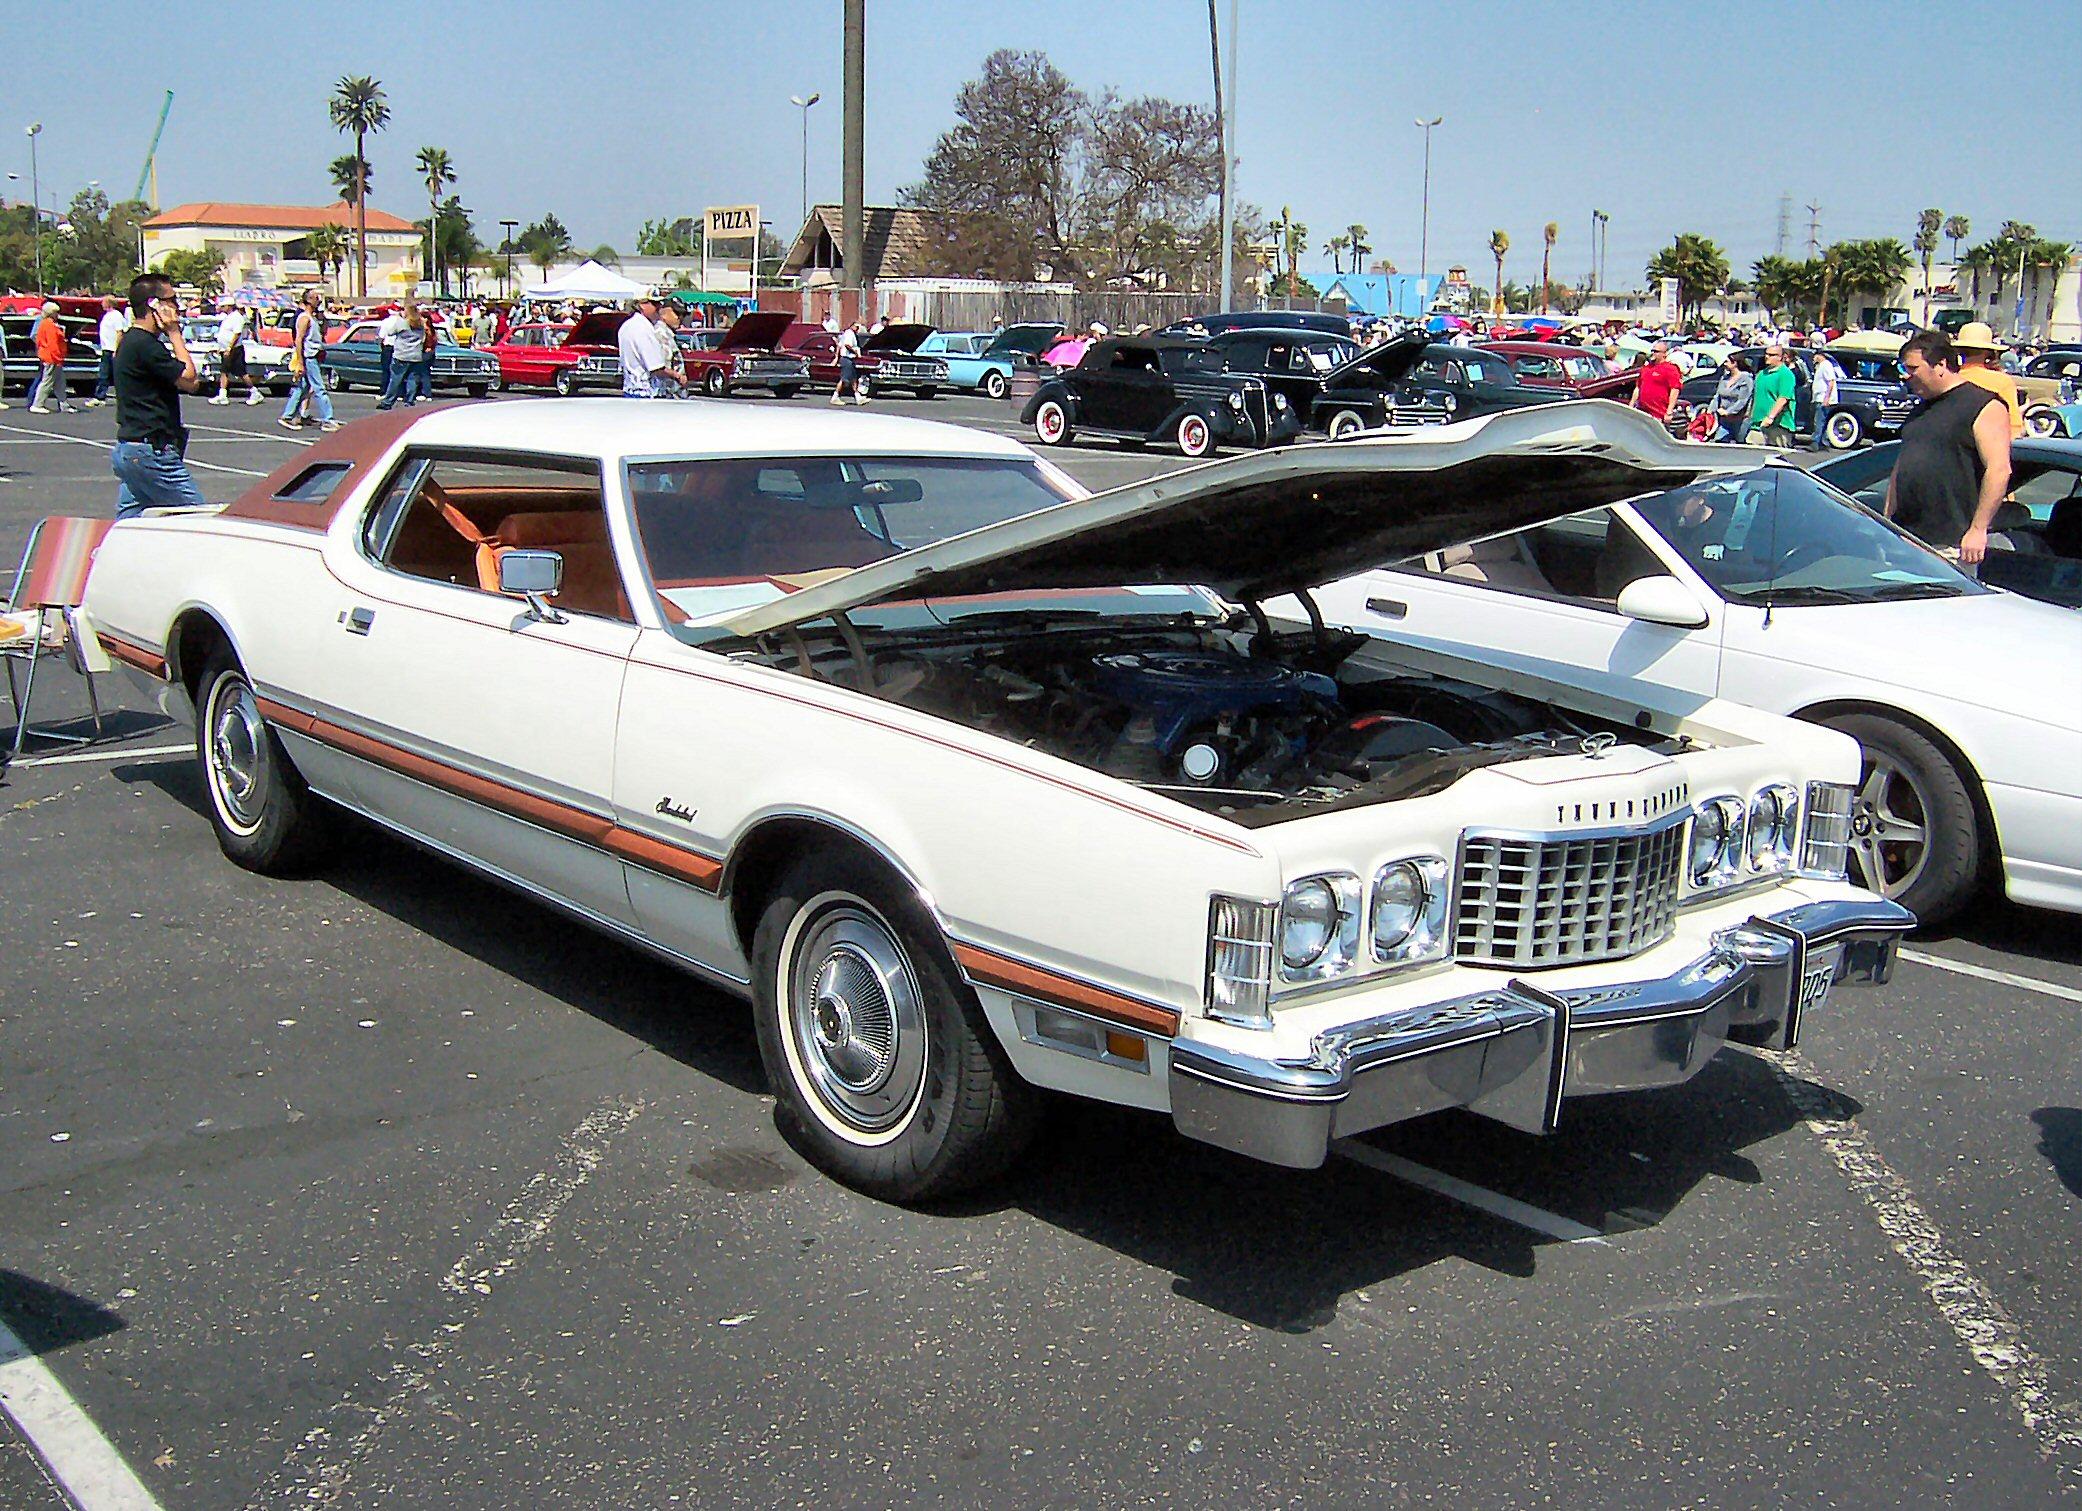 File:1975 Ford Thunderbird.jpg - Wikimedia Commons